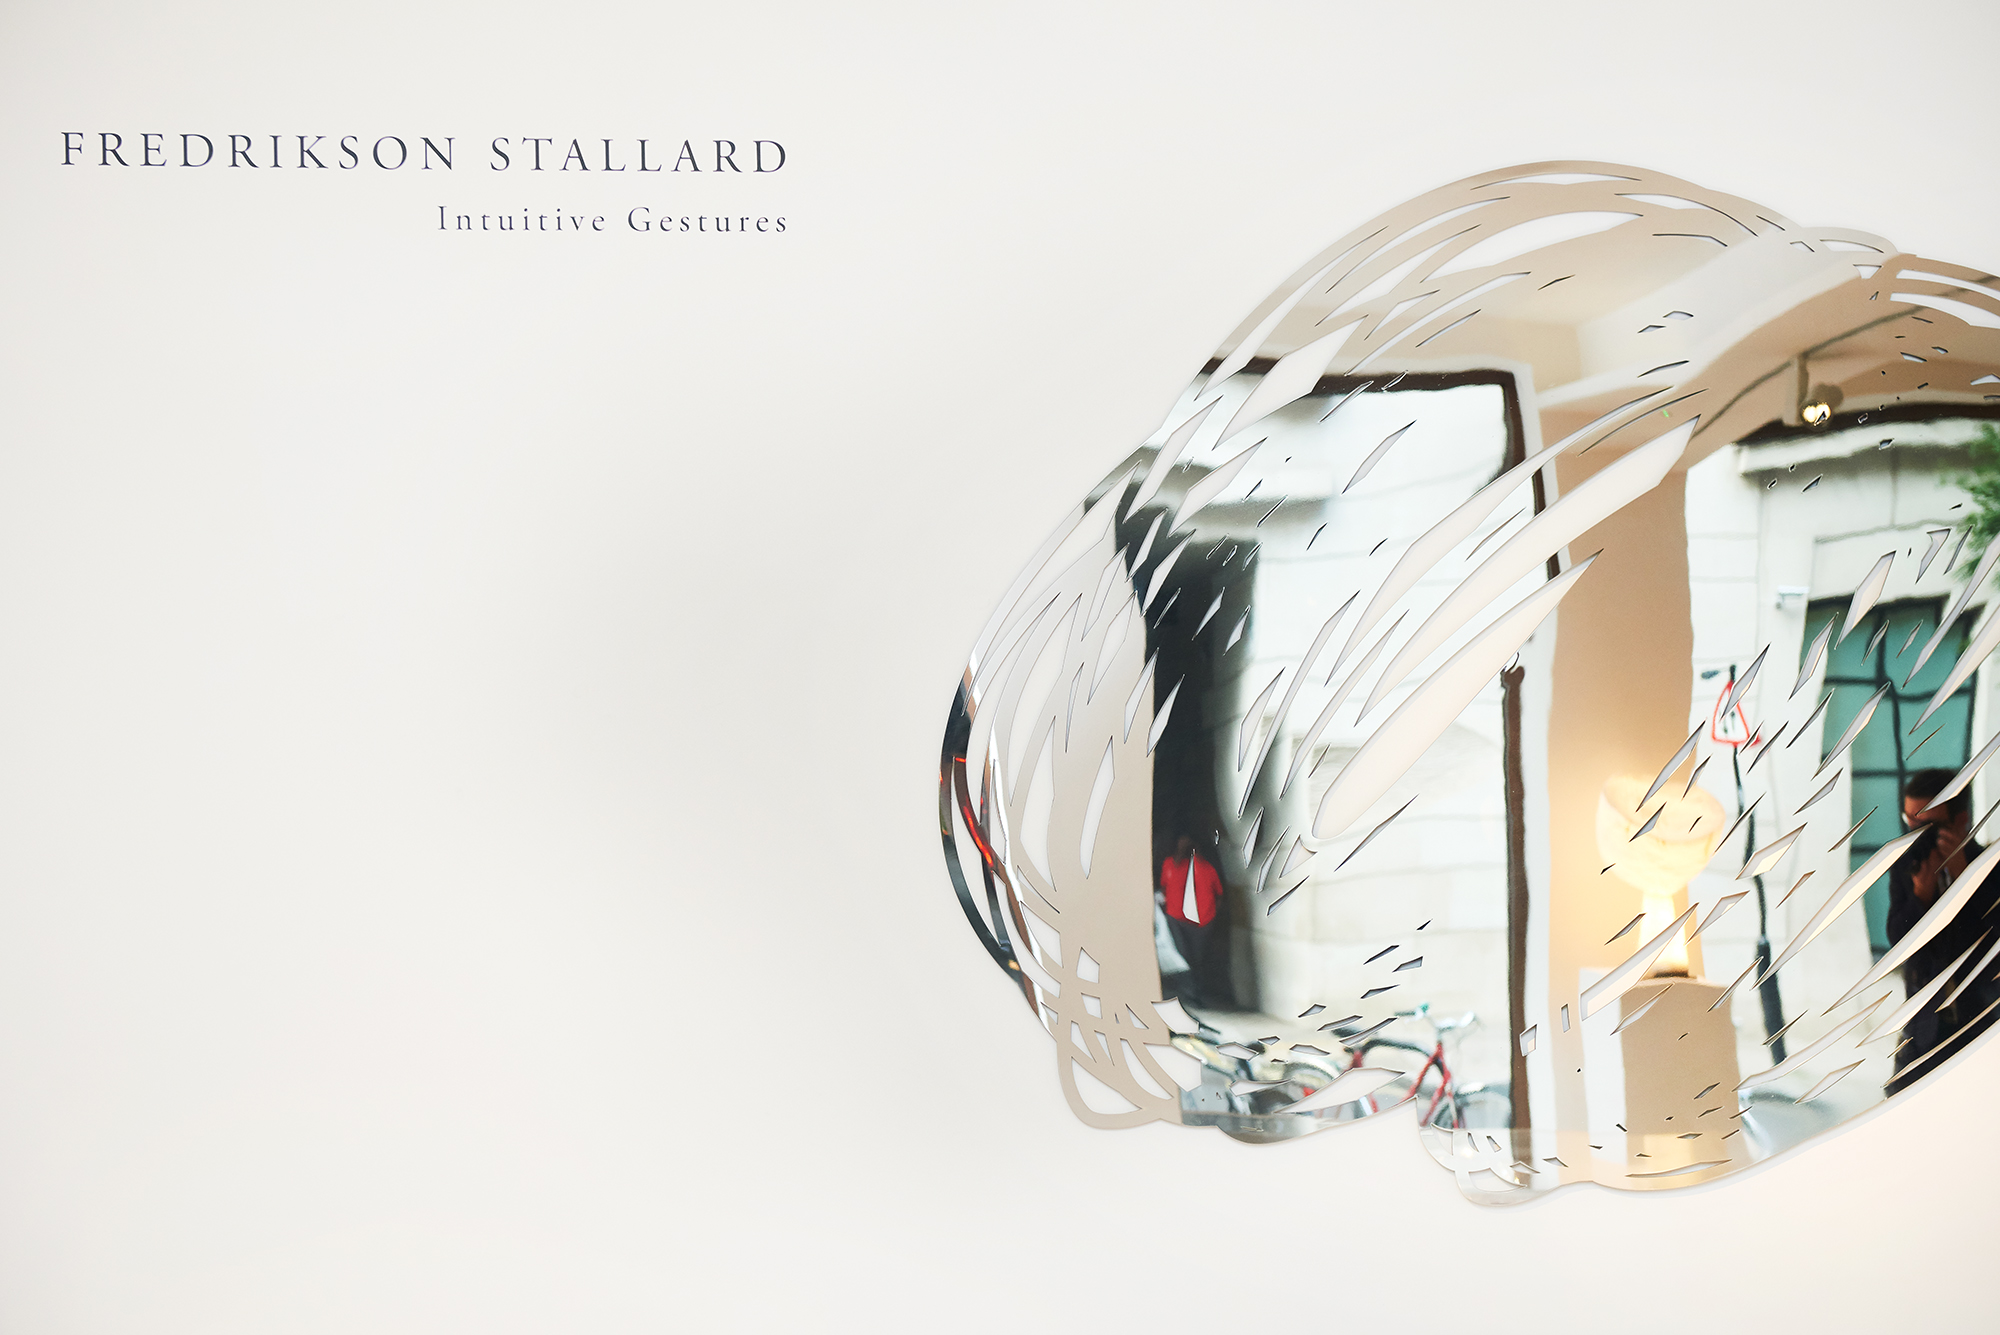 Artist Fredrikson Stallard Exhibition at David Gill Gallery